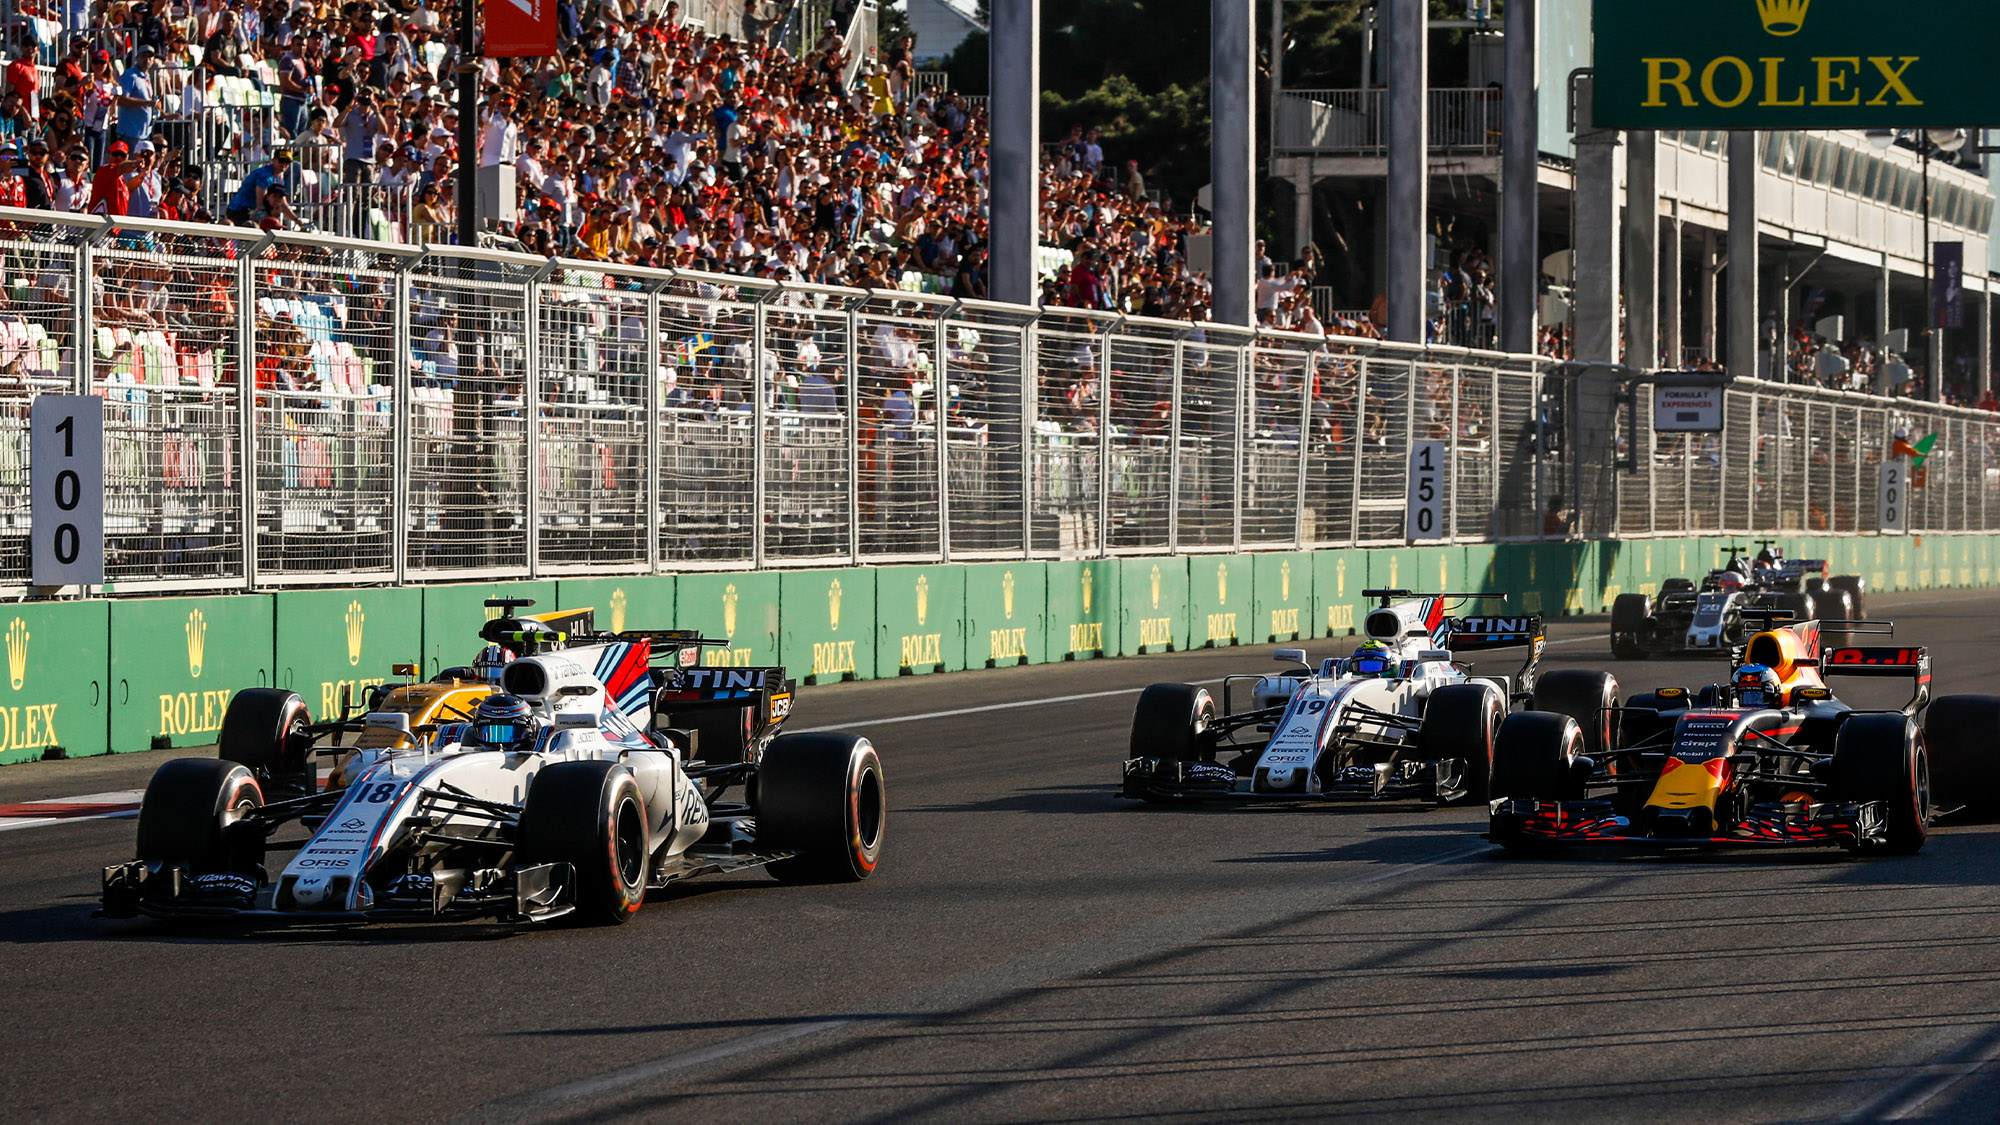 Daniel Ricciardo passes Hulkenberg Massa and Stroll at the 2017 Azerbaijan Grand Prix